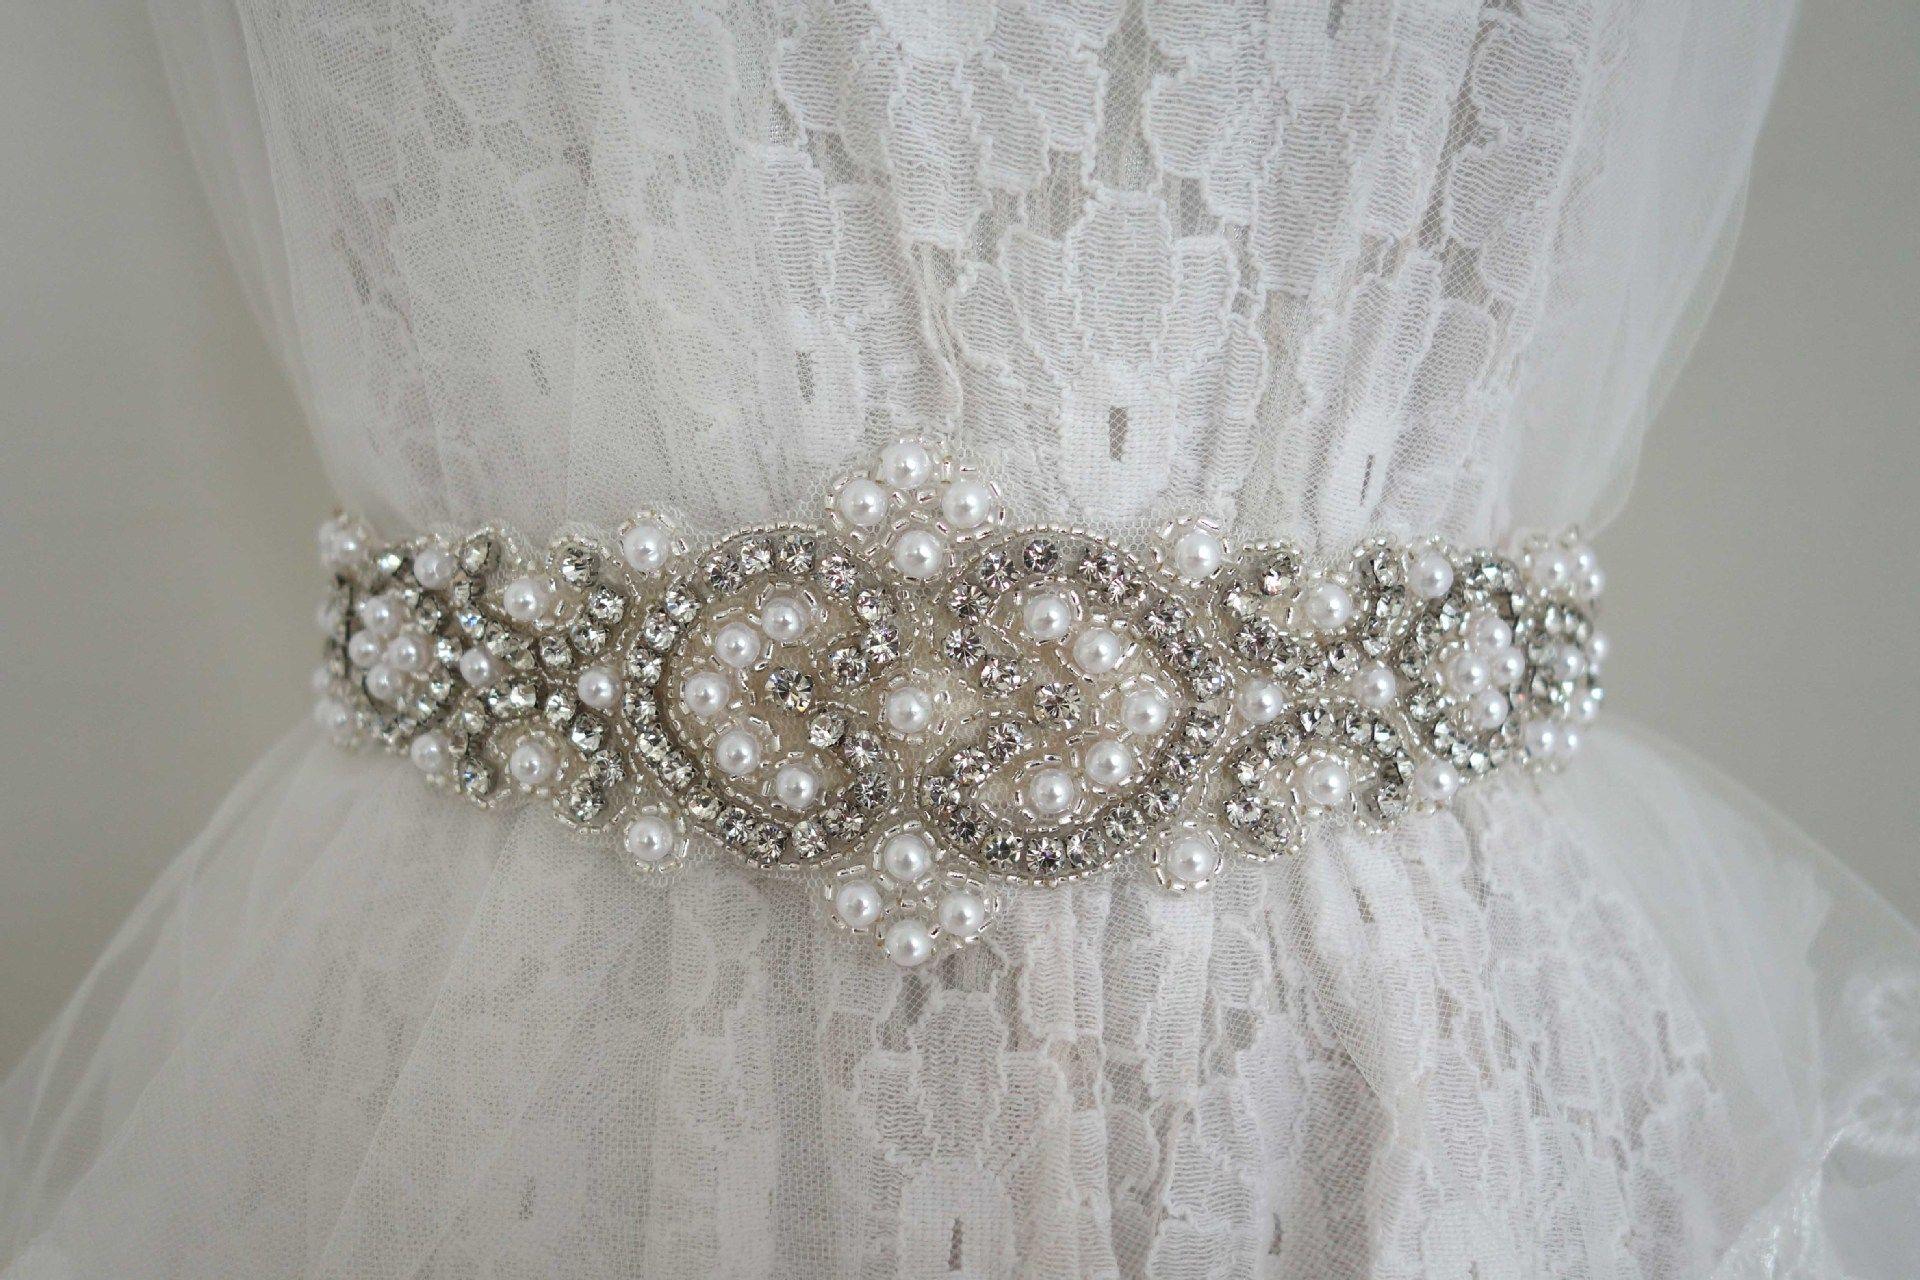 Handmade crystal bridal belt rhinestone pearl luxury wedding dress - See Larger Image